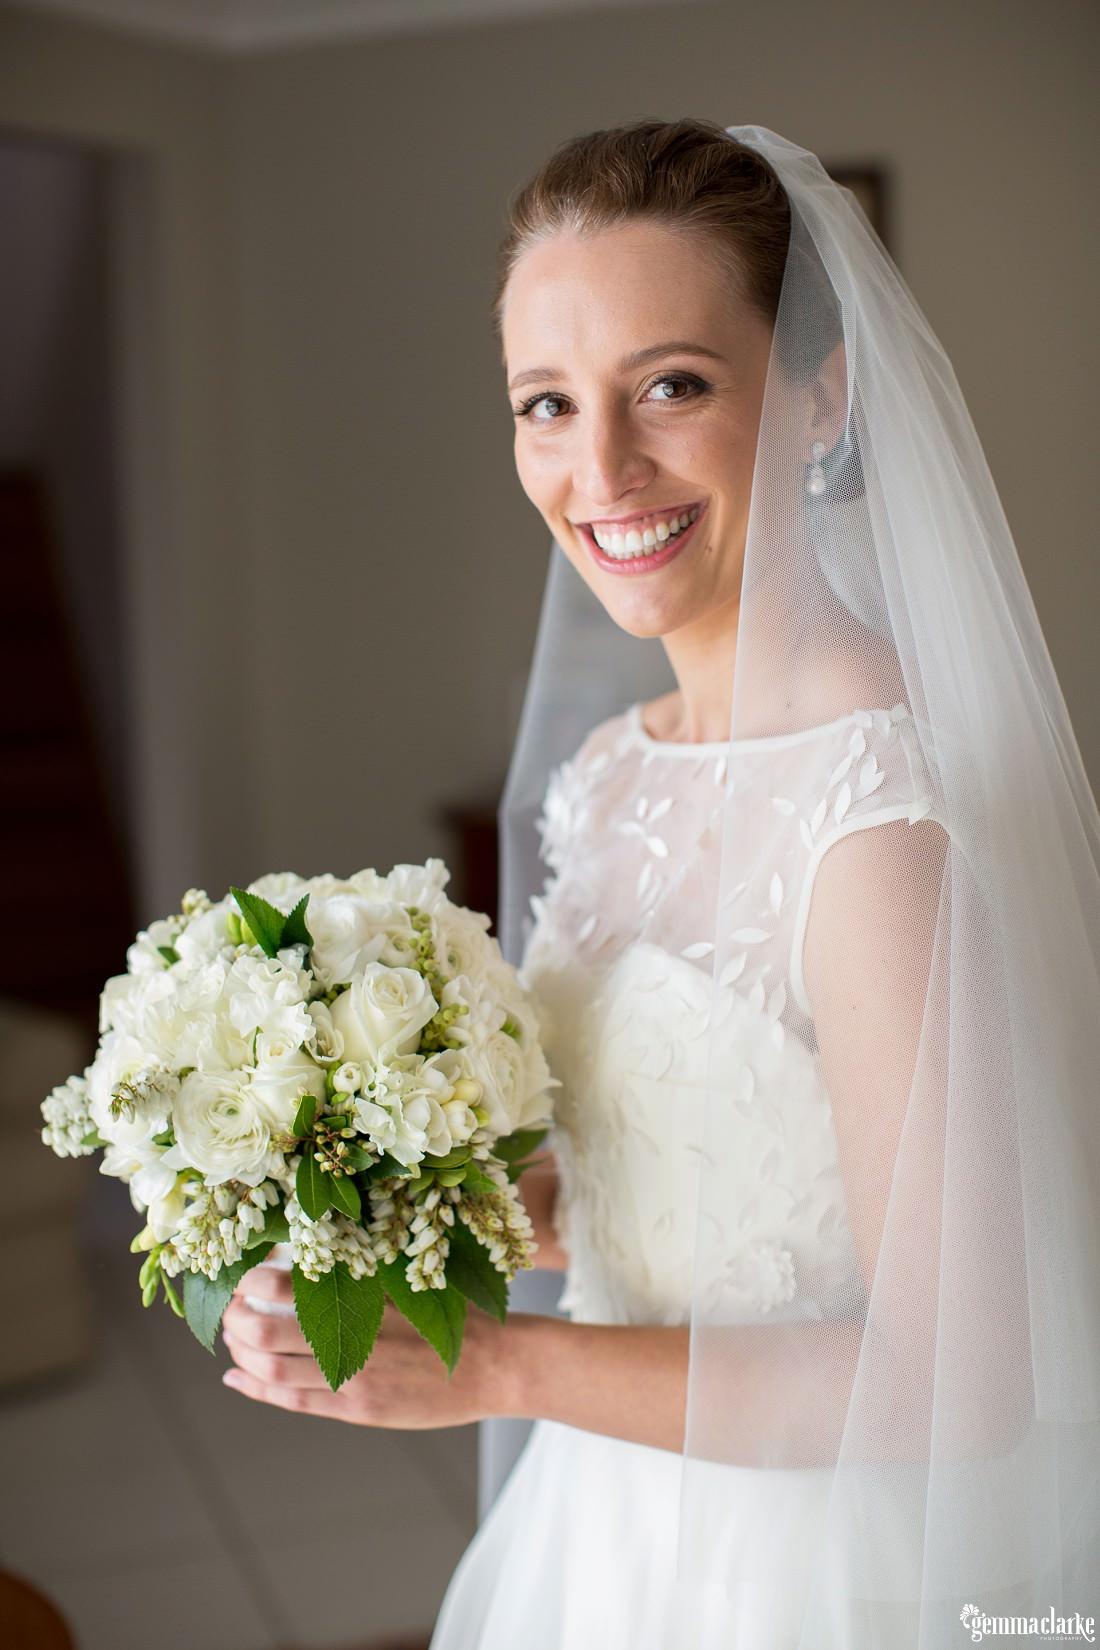 gemma-clarke-photography_kings-school-wedding_balmoral-beach-reception_bathers-pavilion-wedding_luisa-and-nick_0015